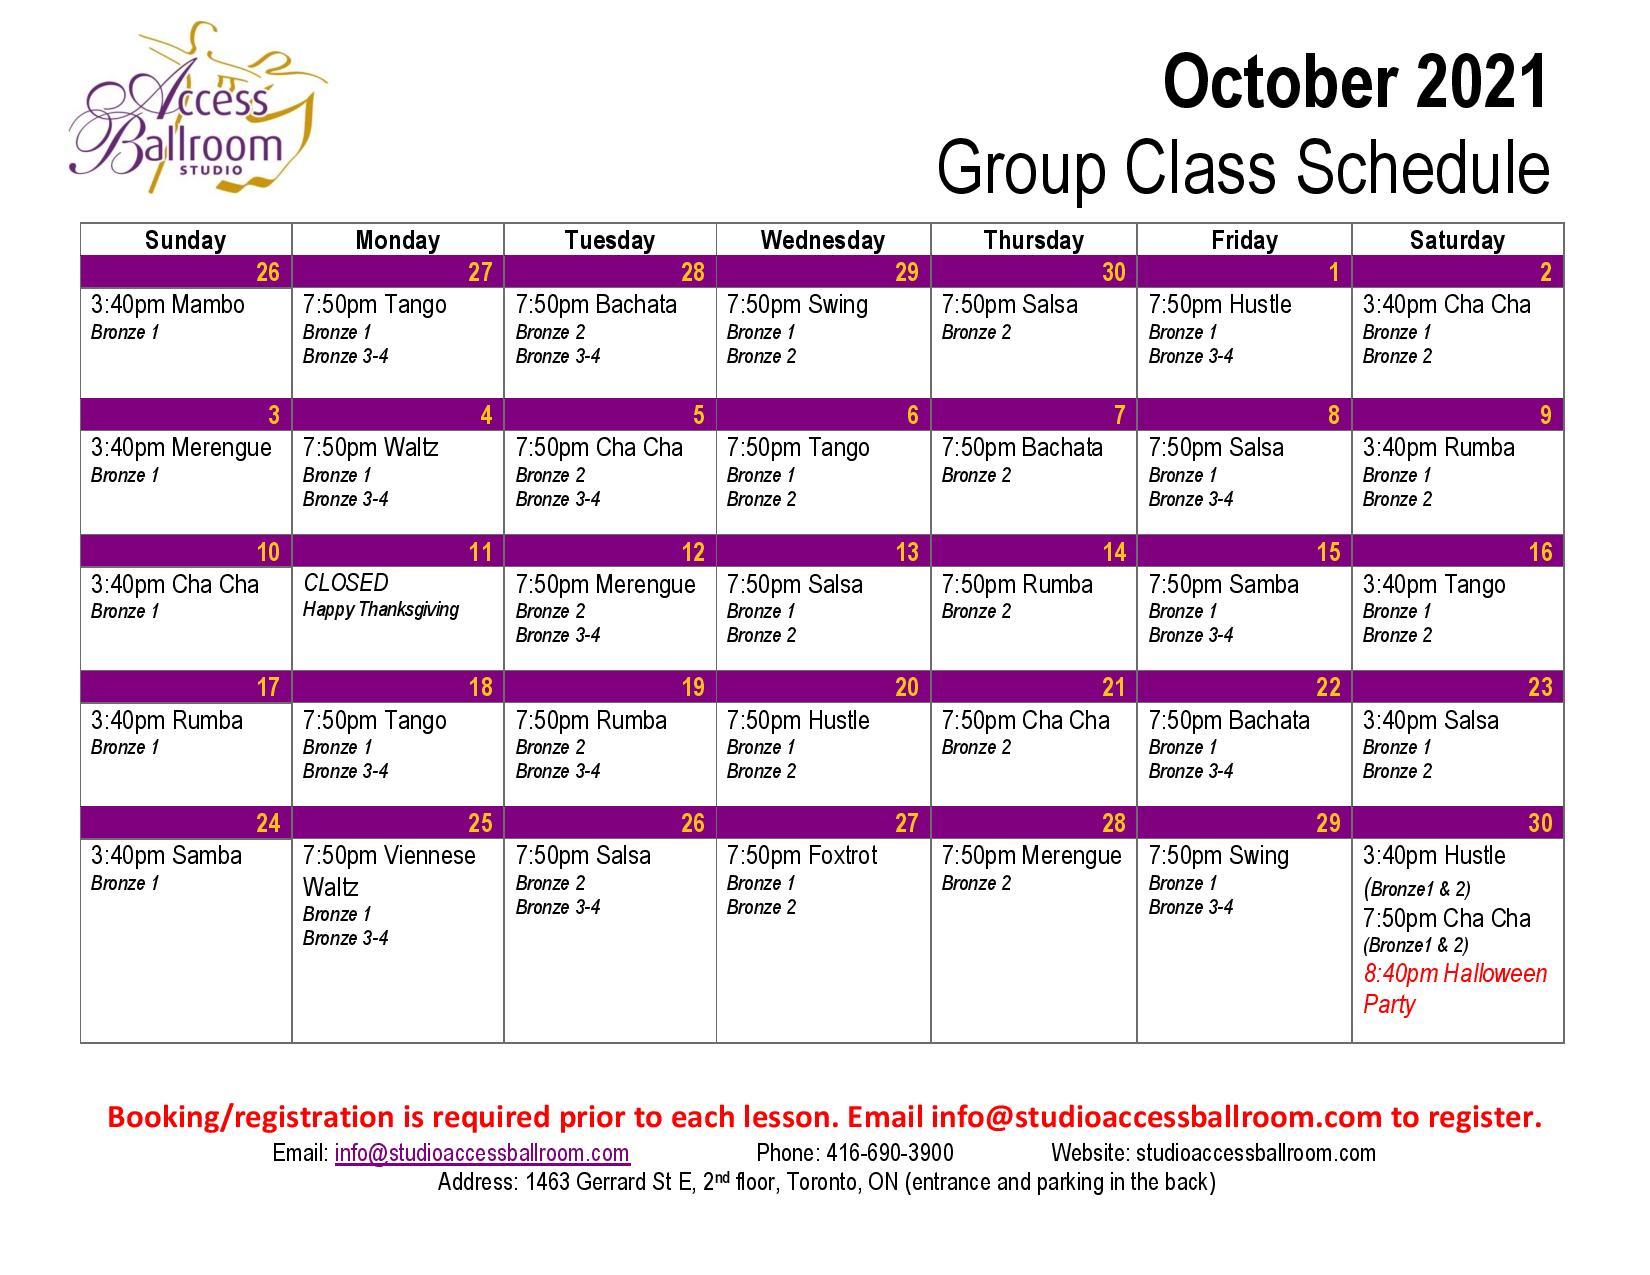 Access Ballroom October 2021 schedule